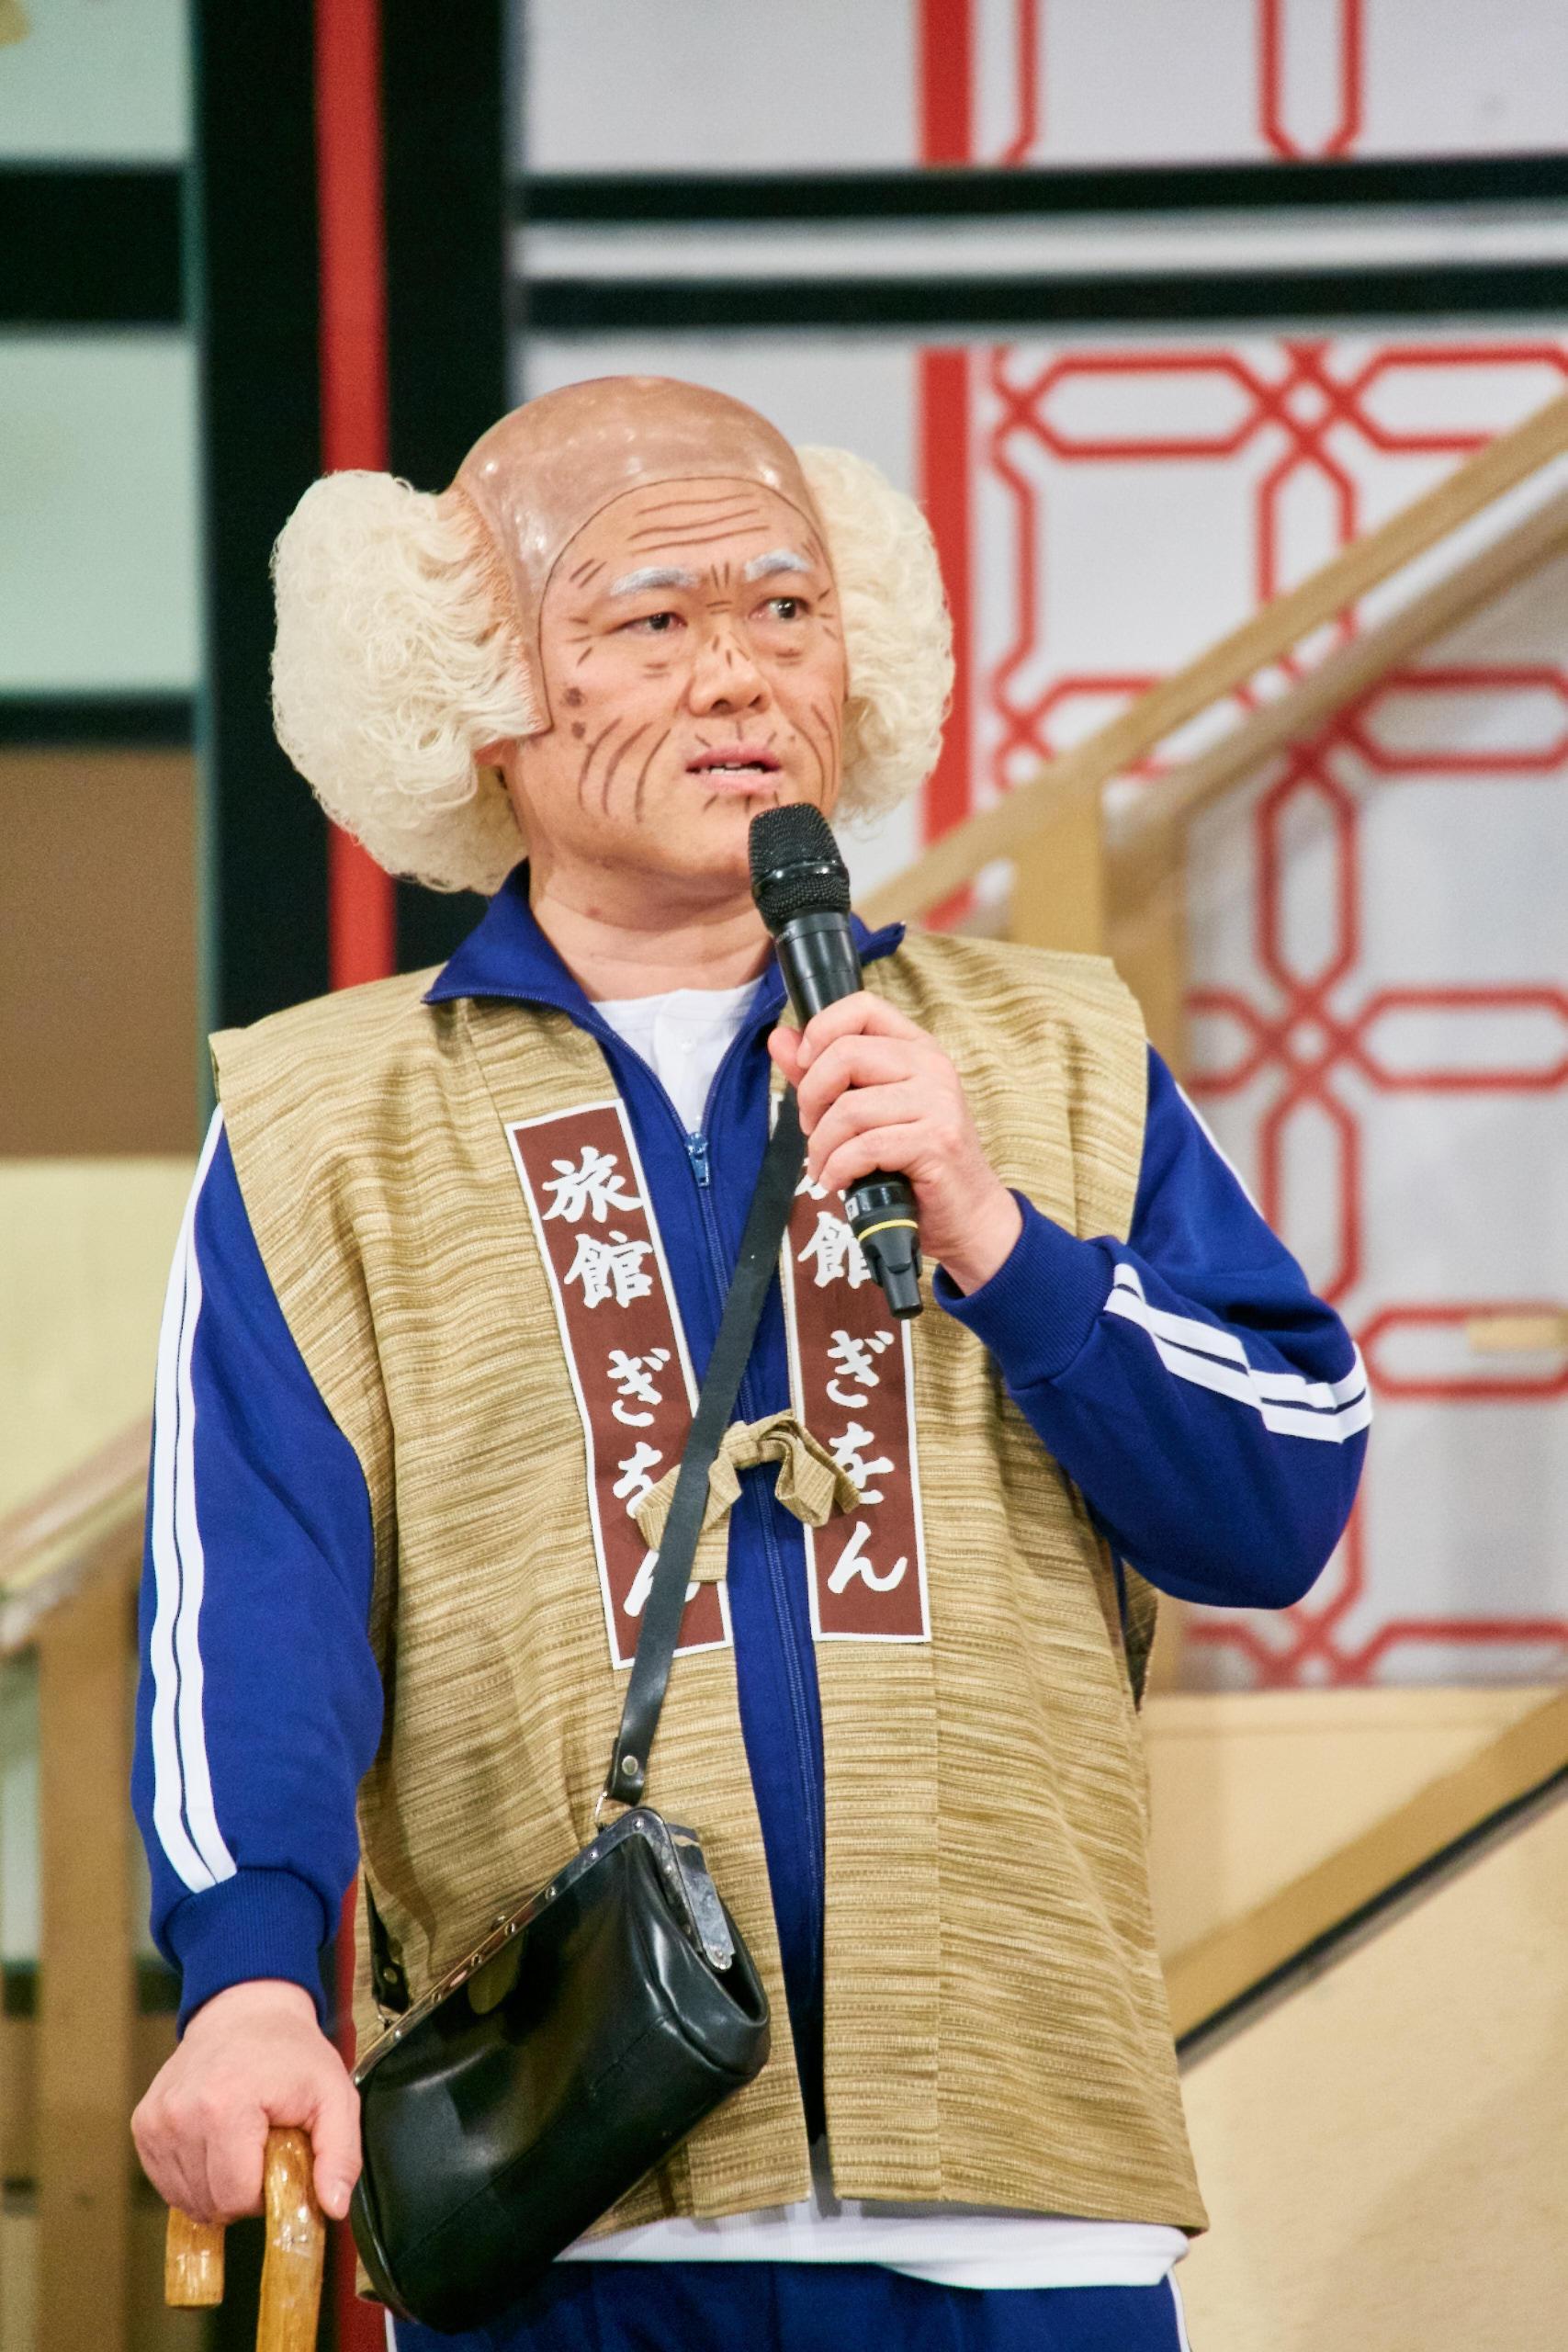 http://news.yoshimoto.co.jp/20180228003021-84772a009c52b47031d6e4521912e80bd69e103b.jpg